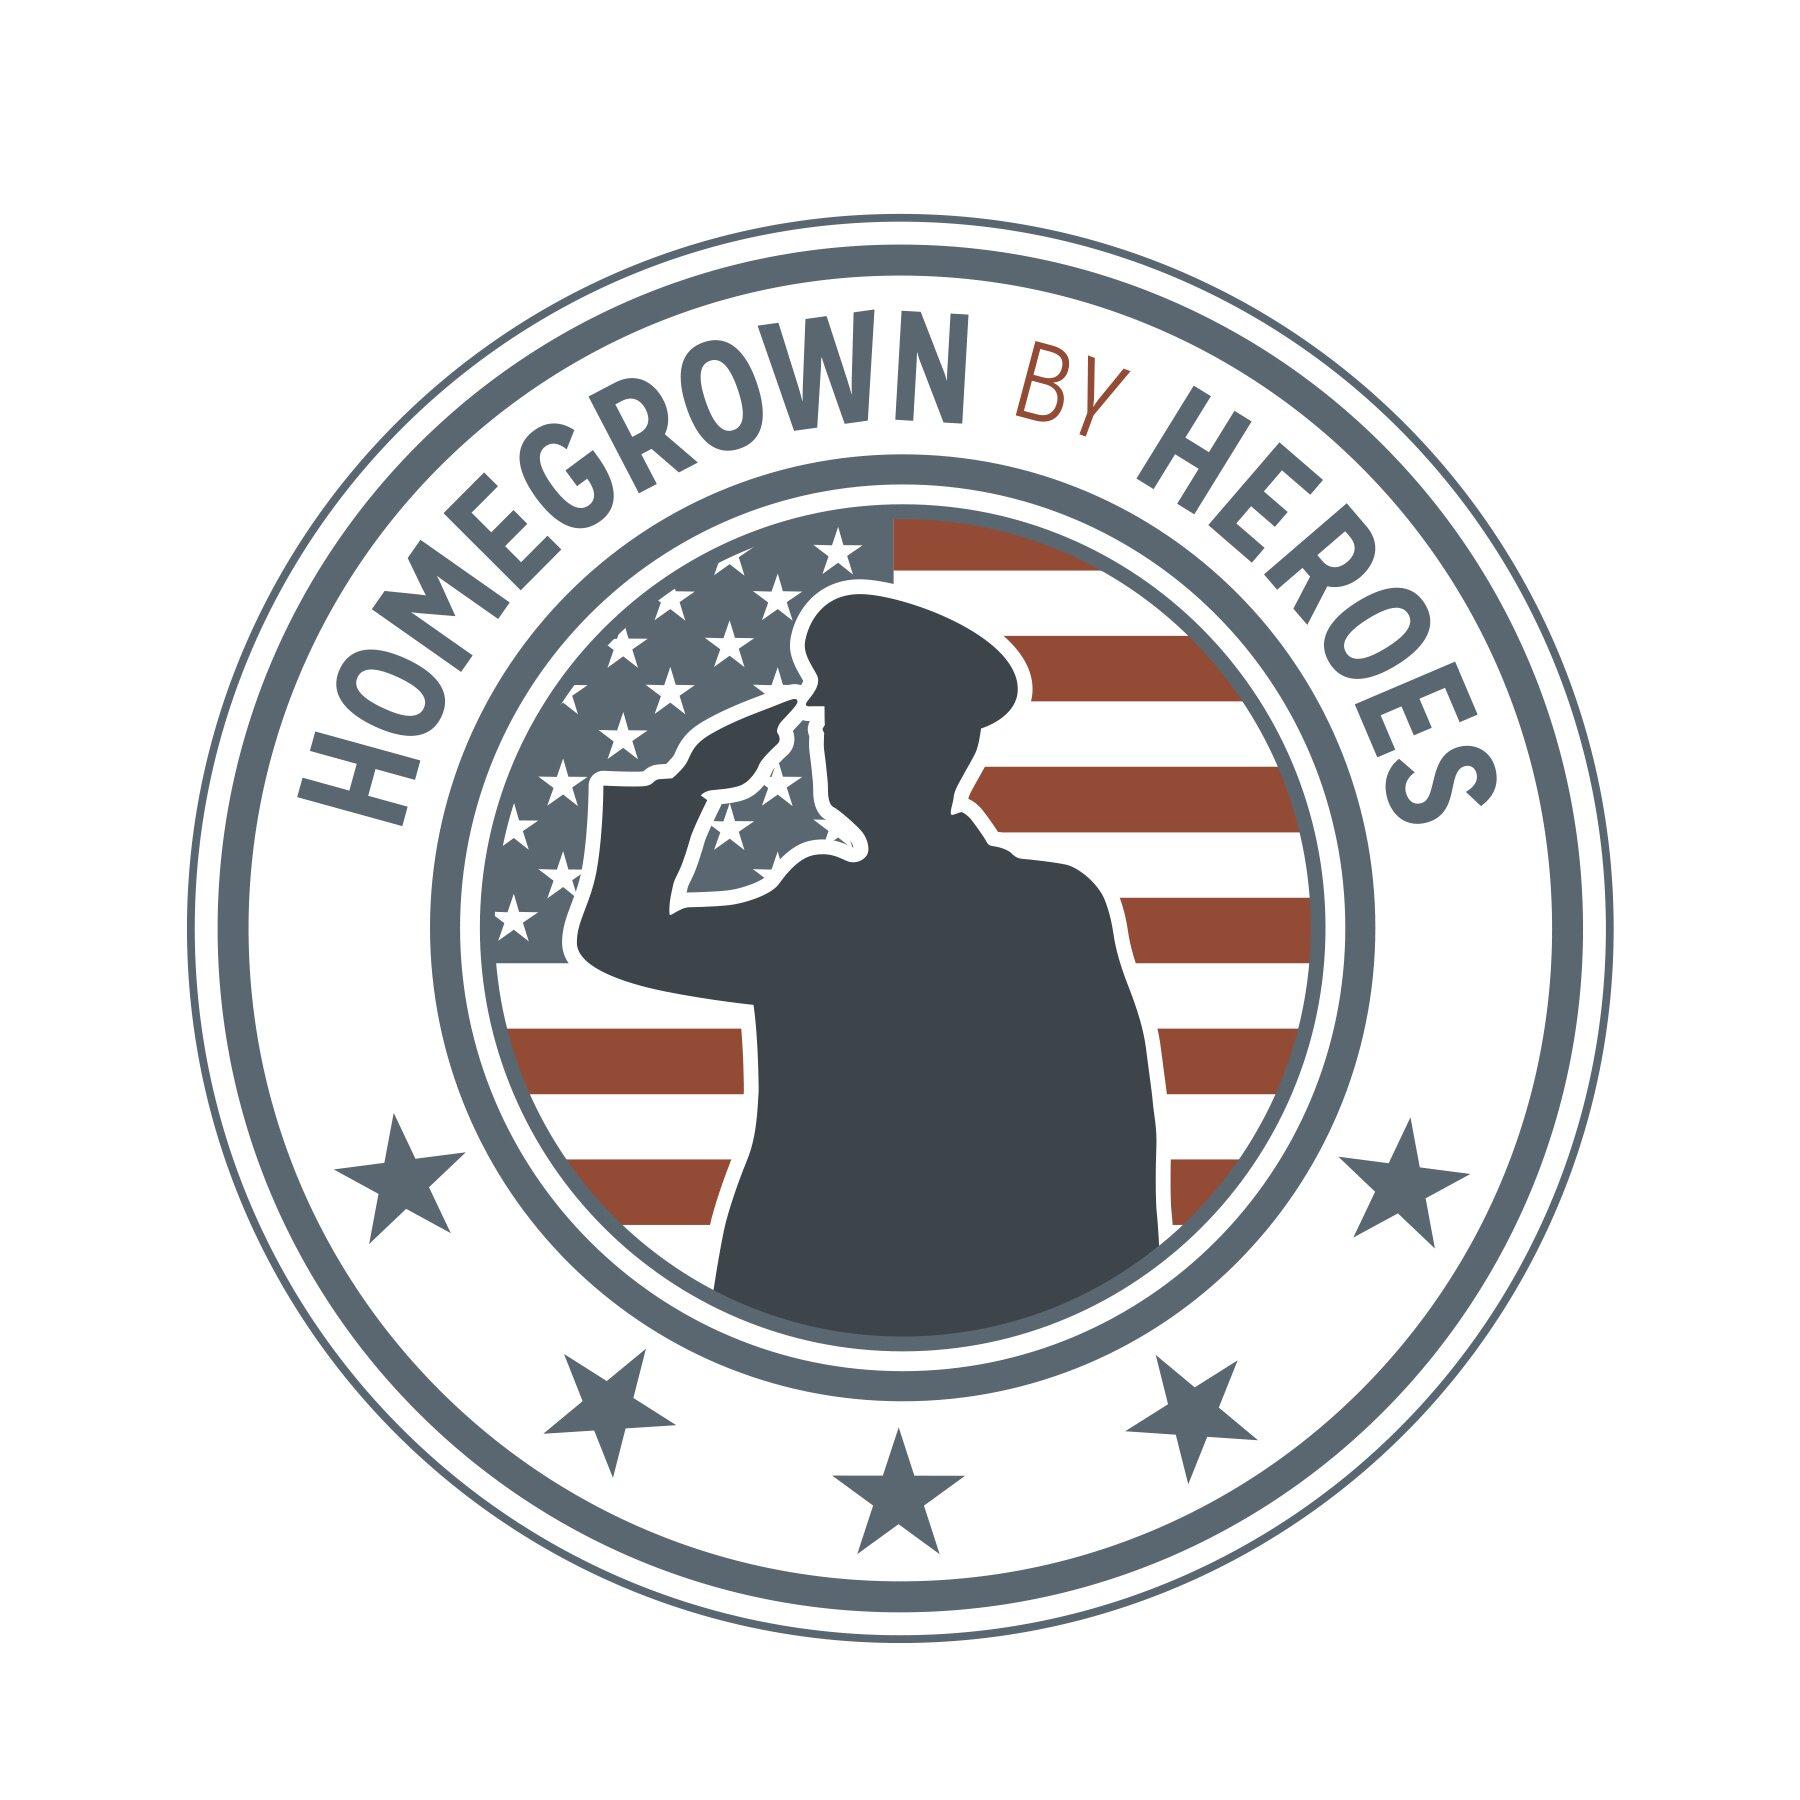 hgbh logo.jpg